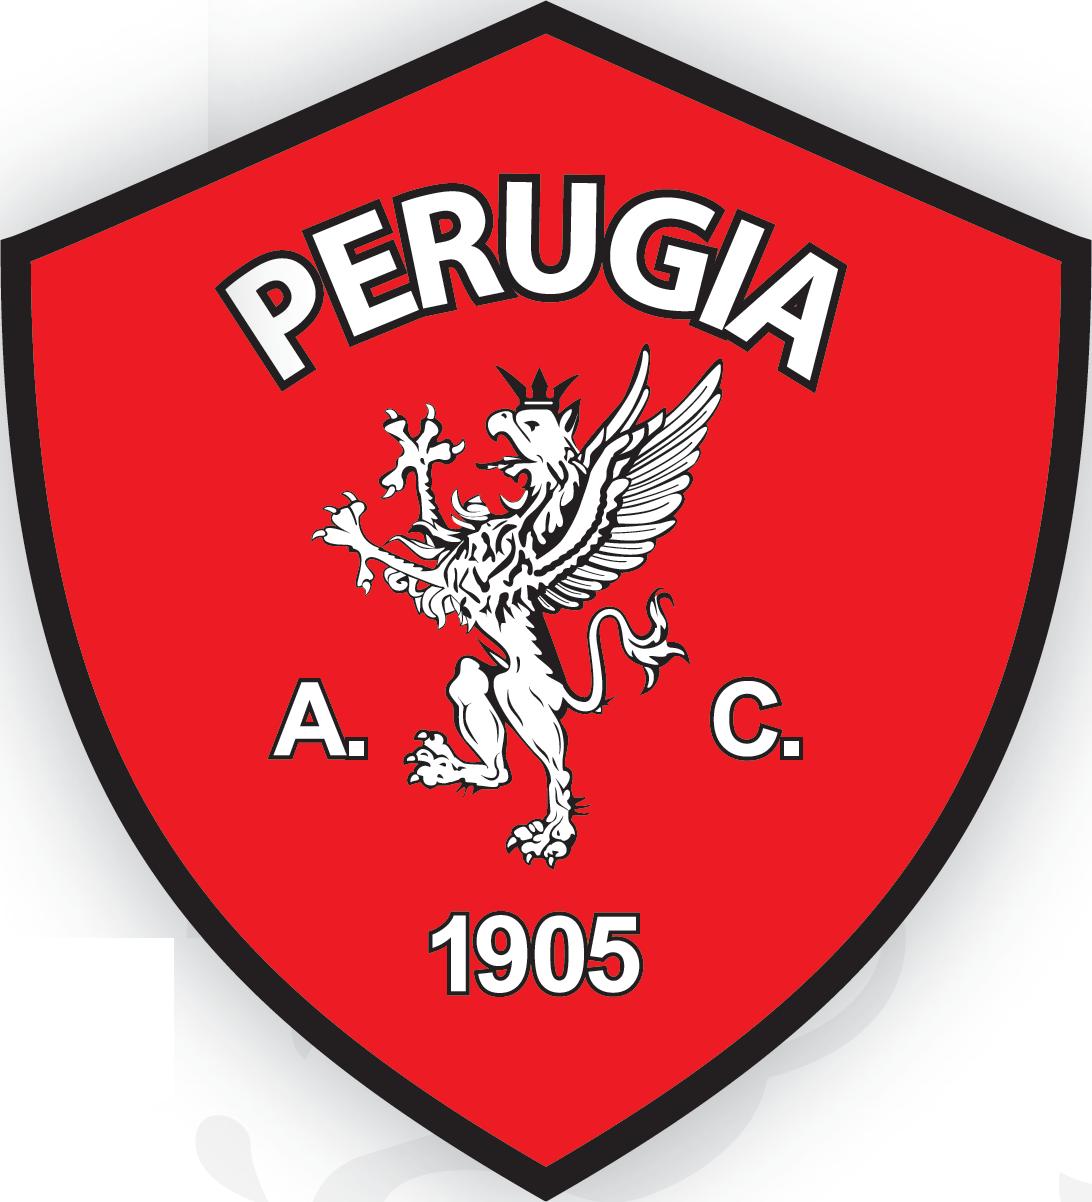 Associazione Calcistica Perugia Calcio Wikipedia